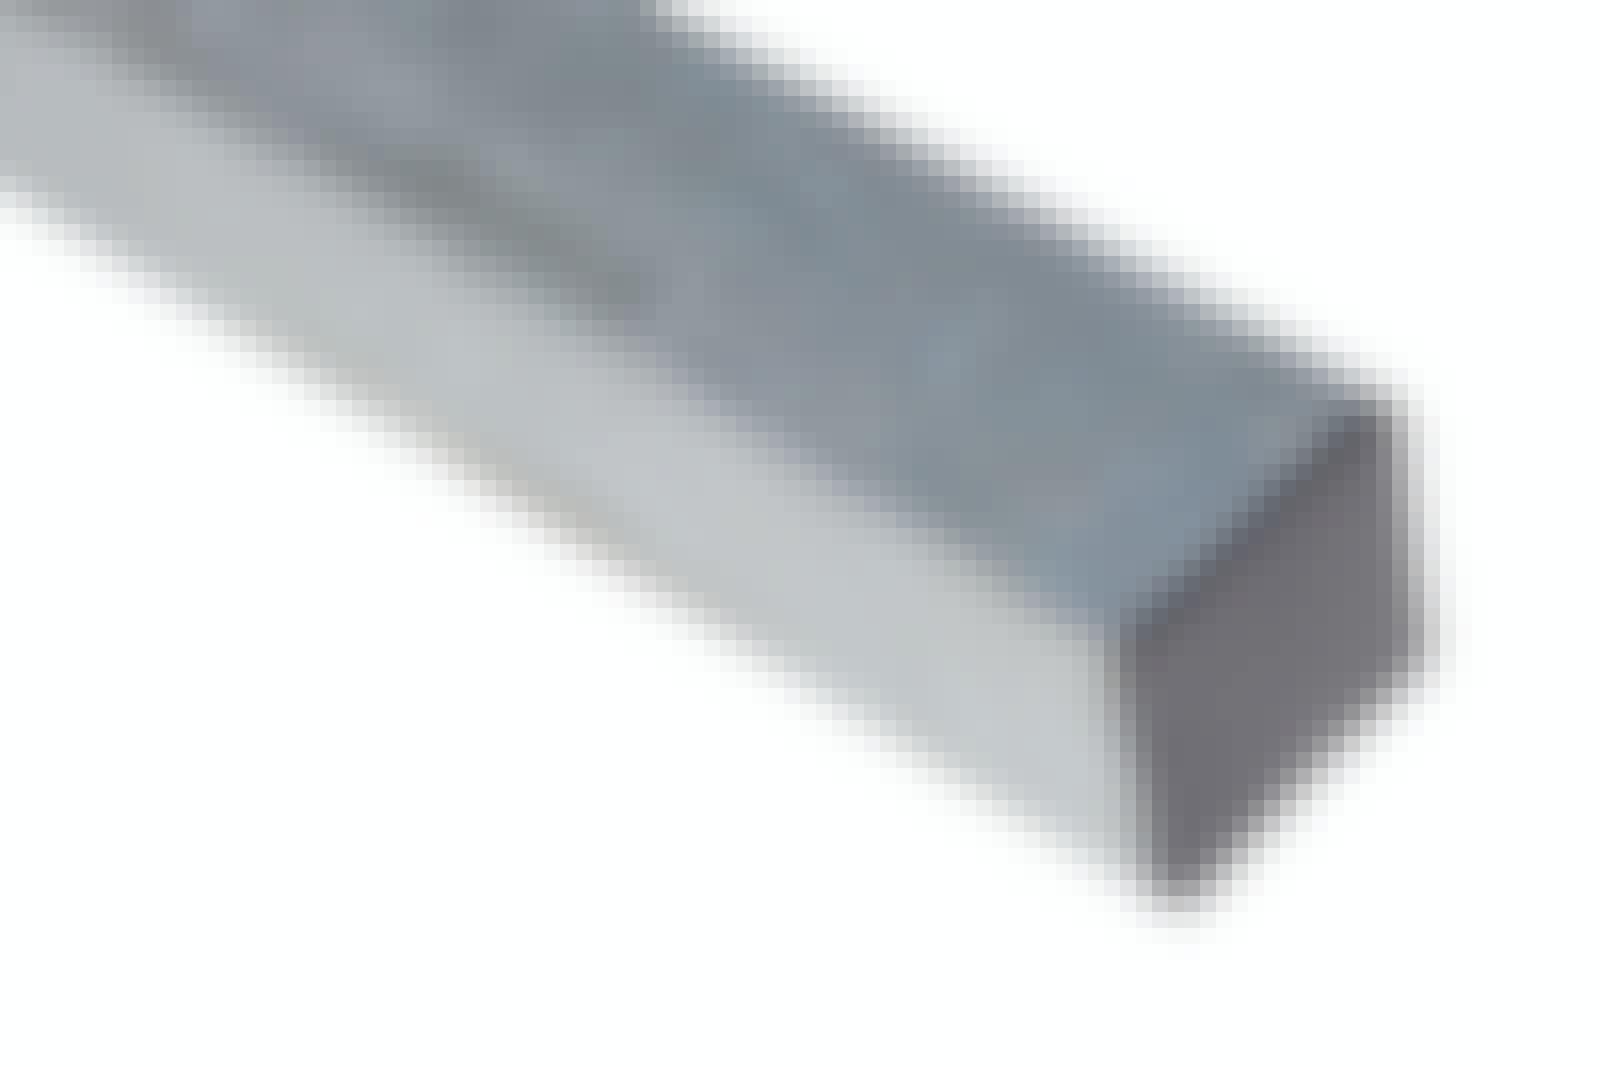 Stolper: Hegnsstolper i stål